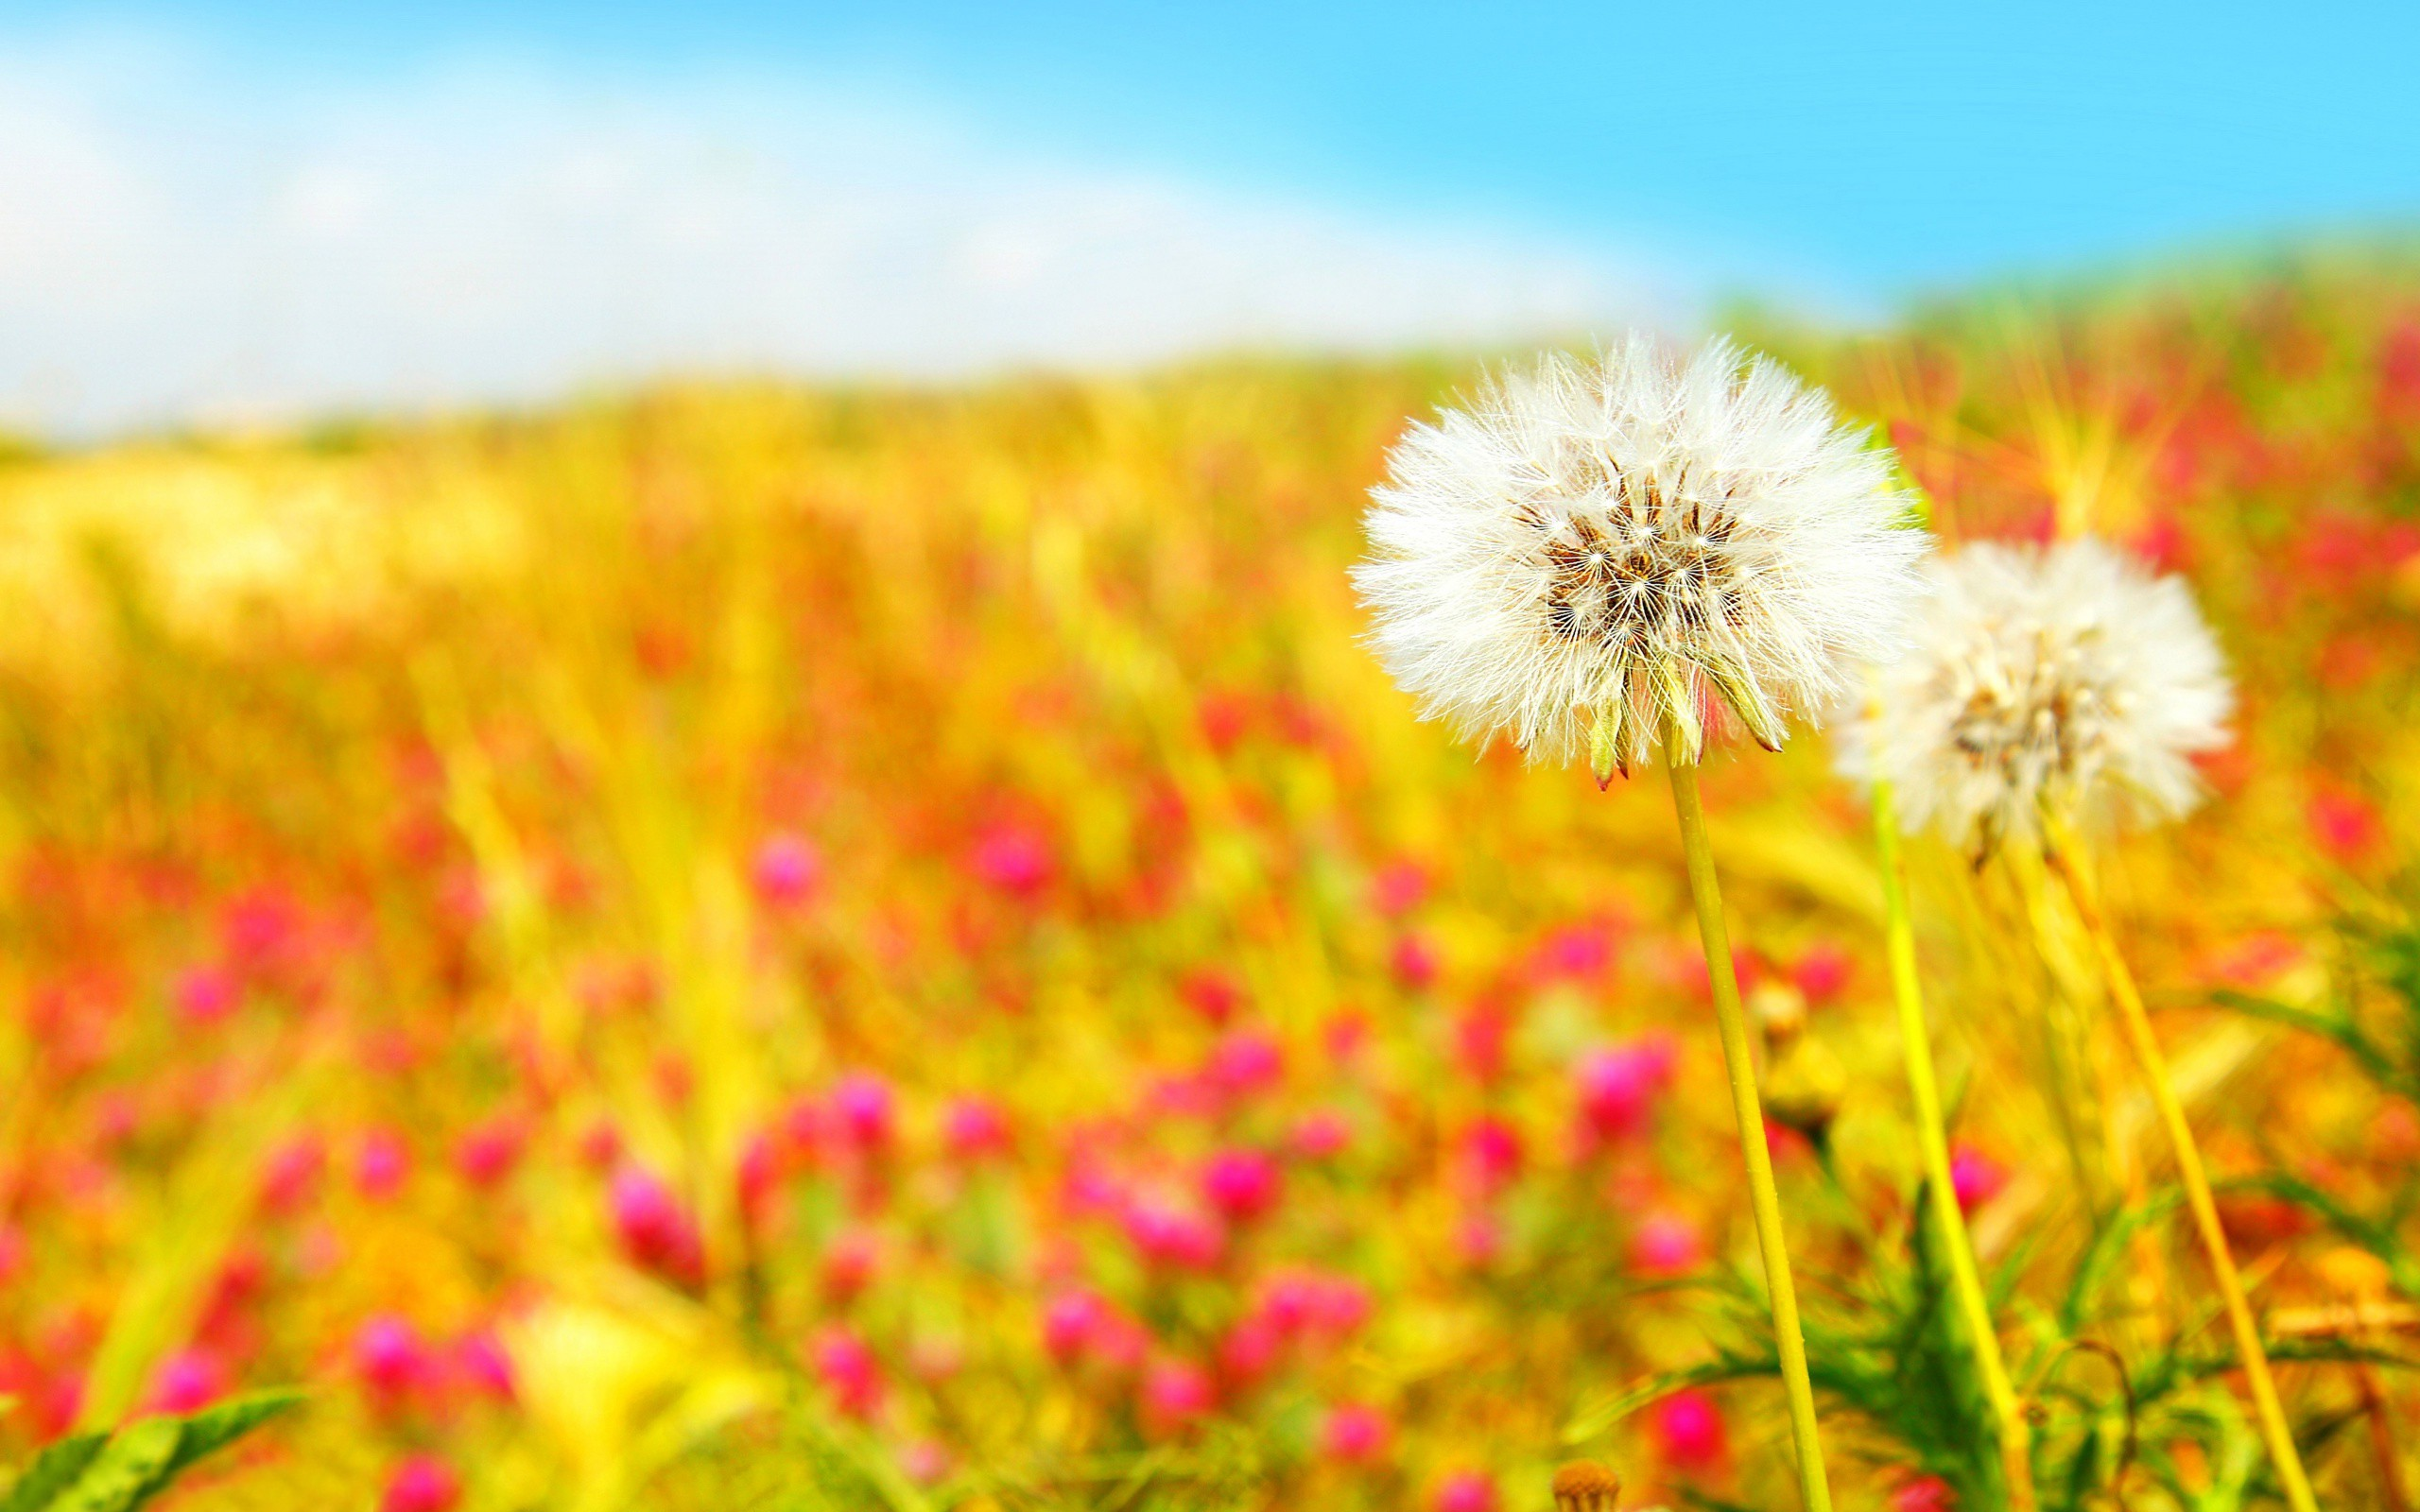 Summer blurred dandelions